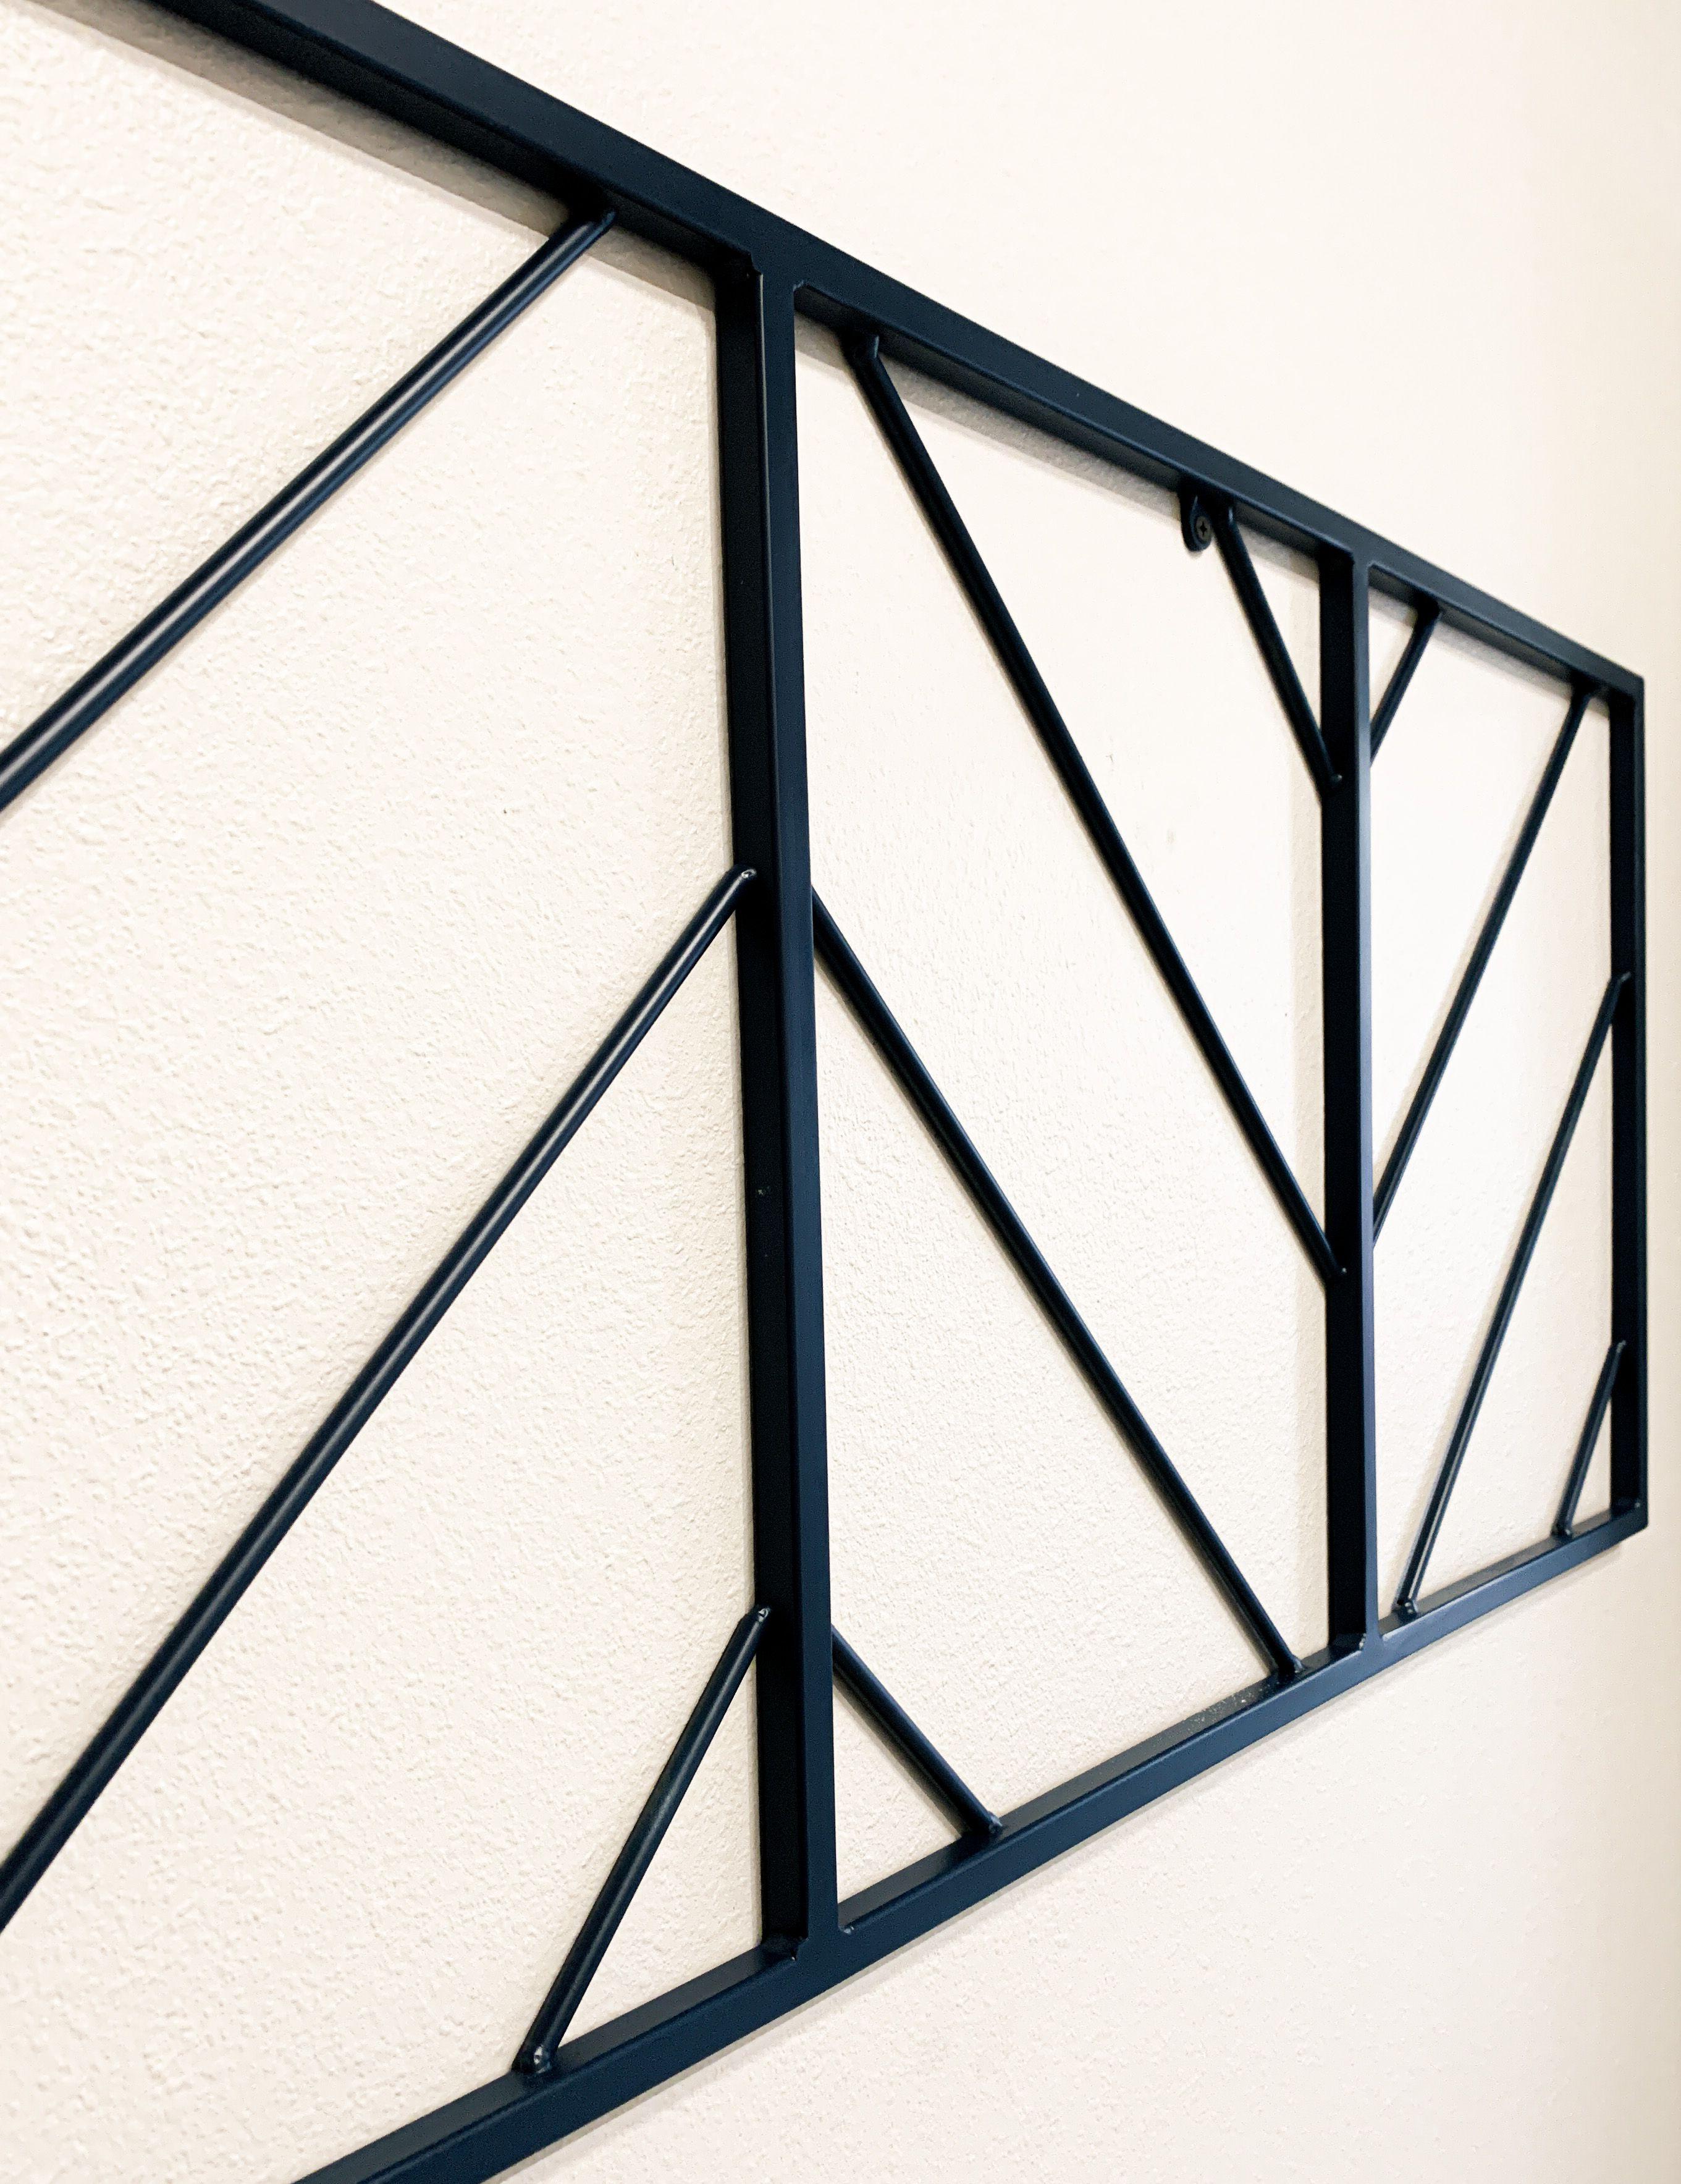 Chevron Herringbone Wall Art Decor Dimensions 48 Wide 18 Tall Herringbone Wall Art Metal Wall Art Wall Art Decor